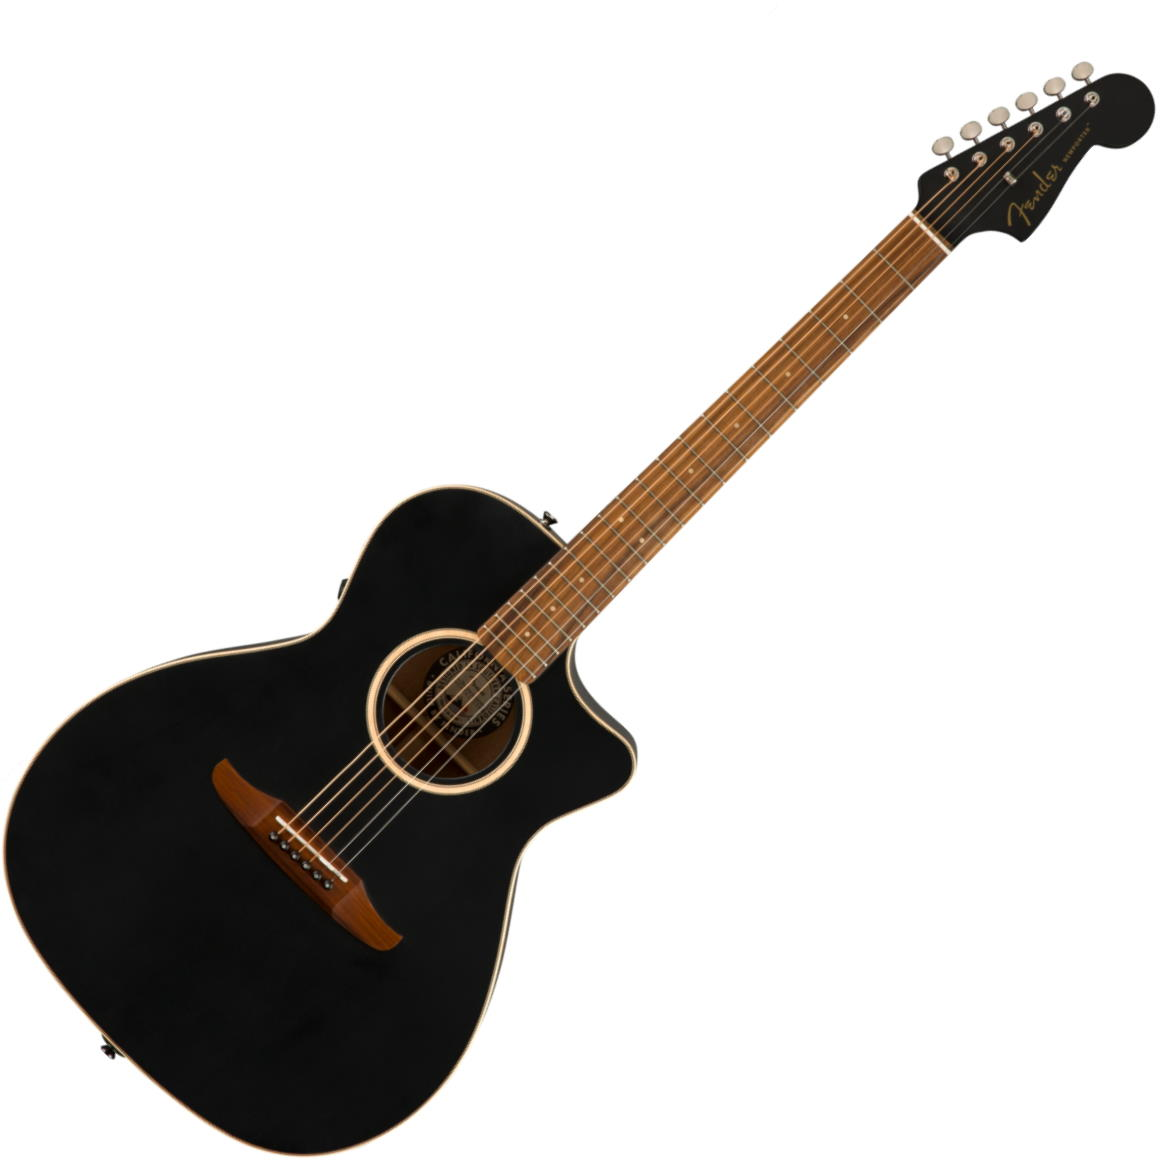 Fender Newporter Special Acoustic Electric Guitar